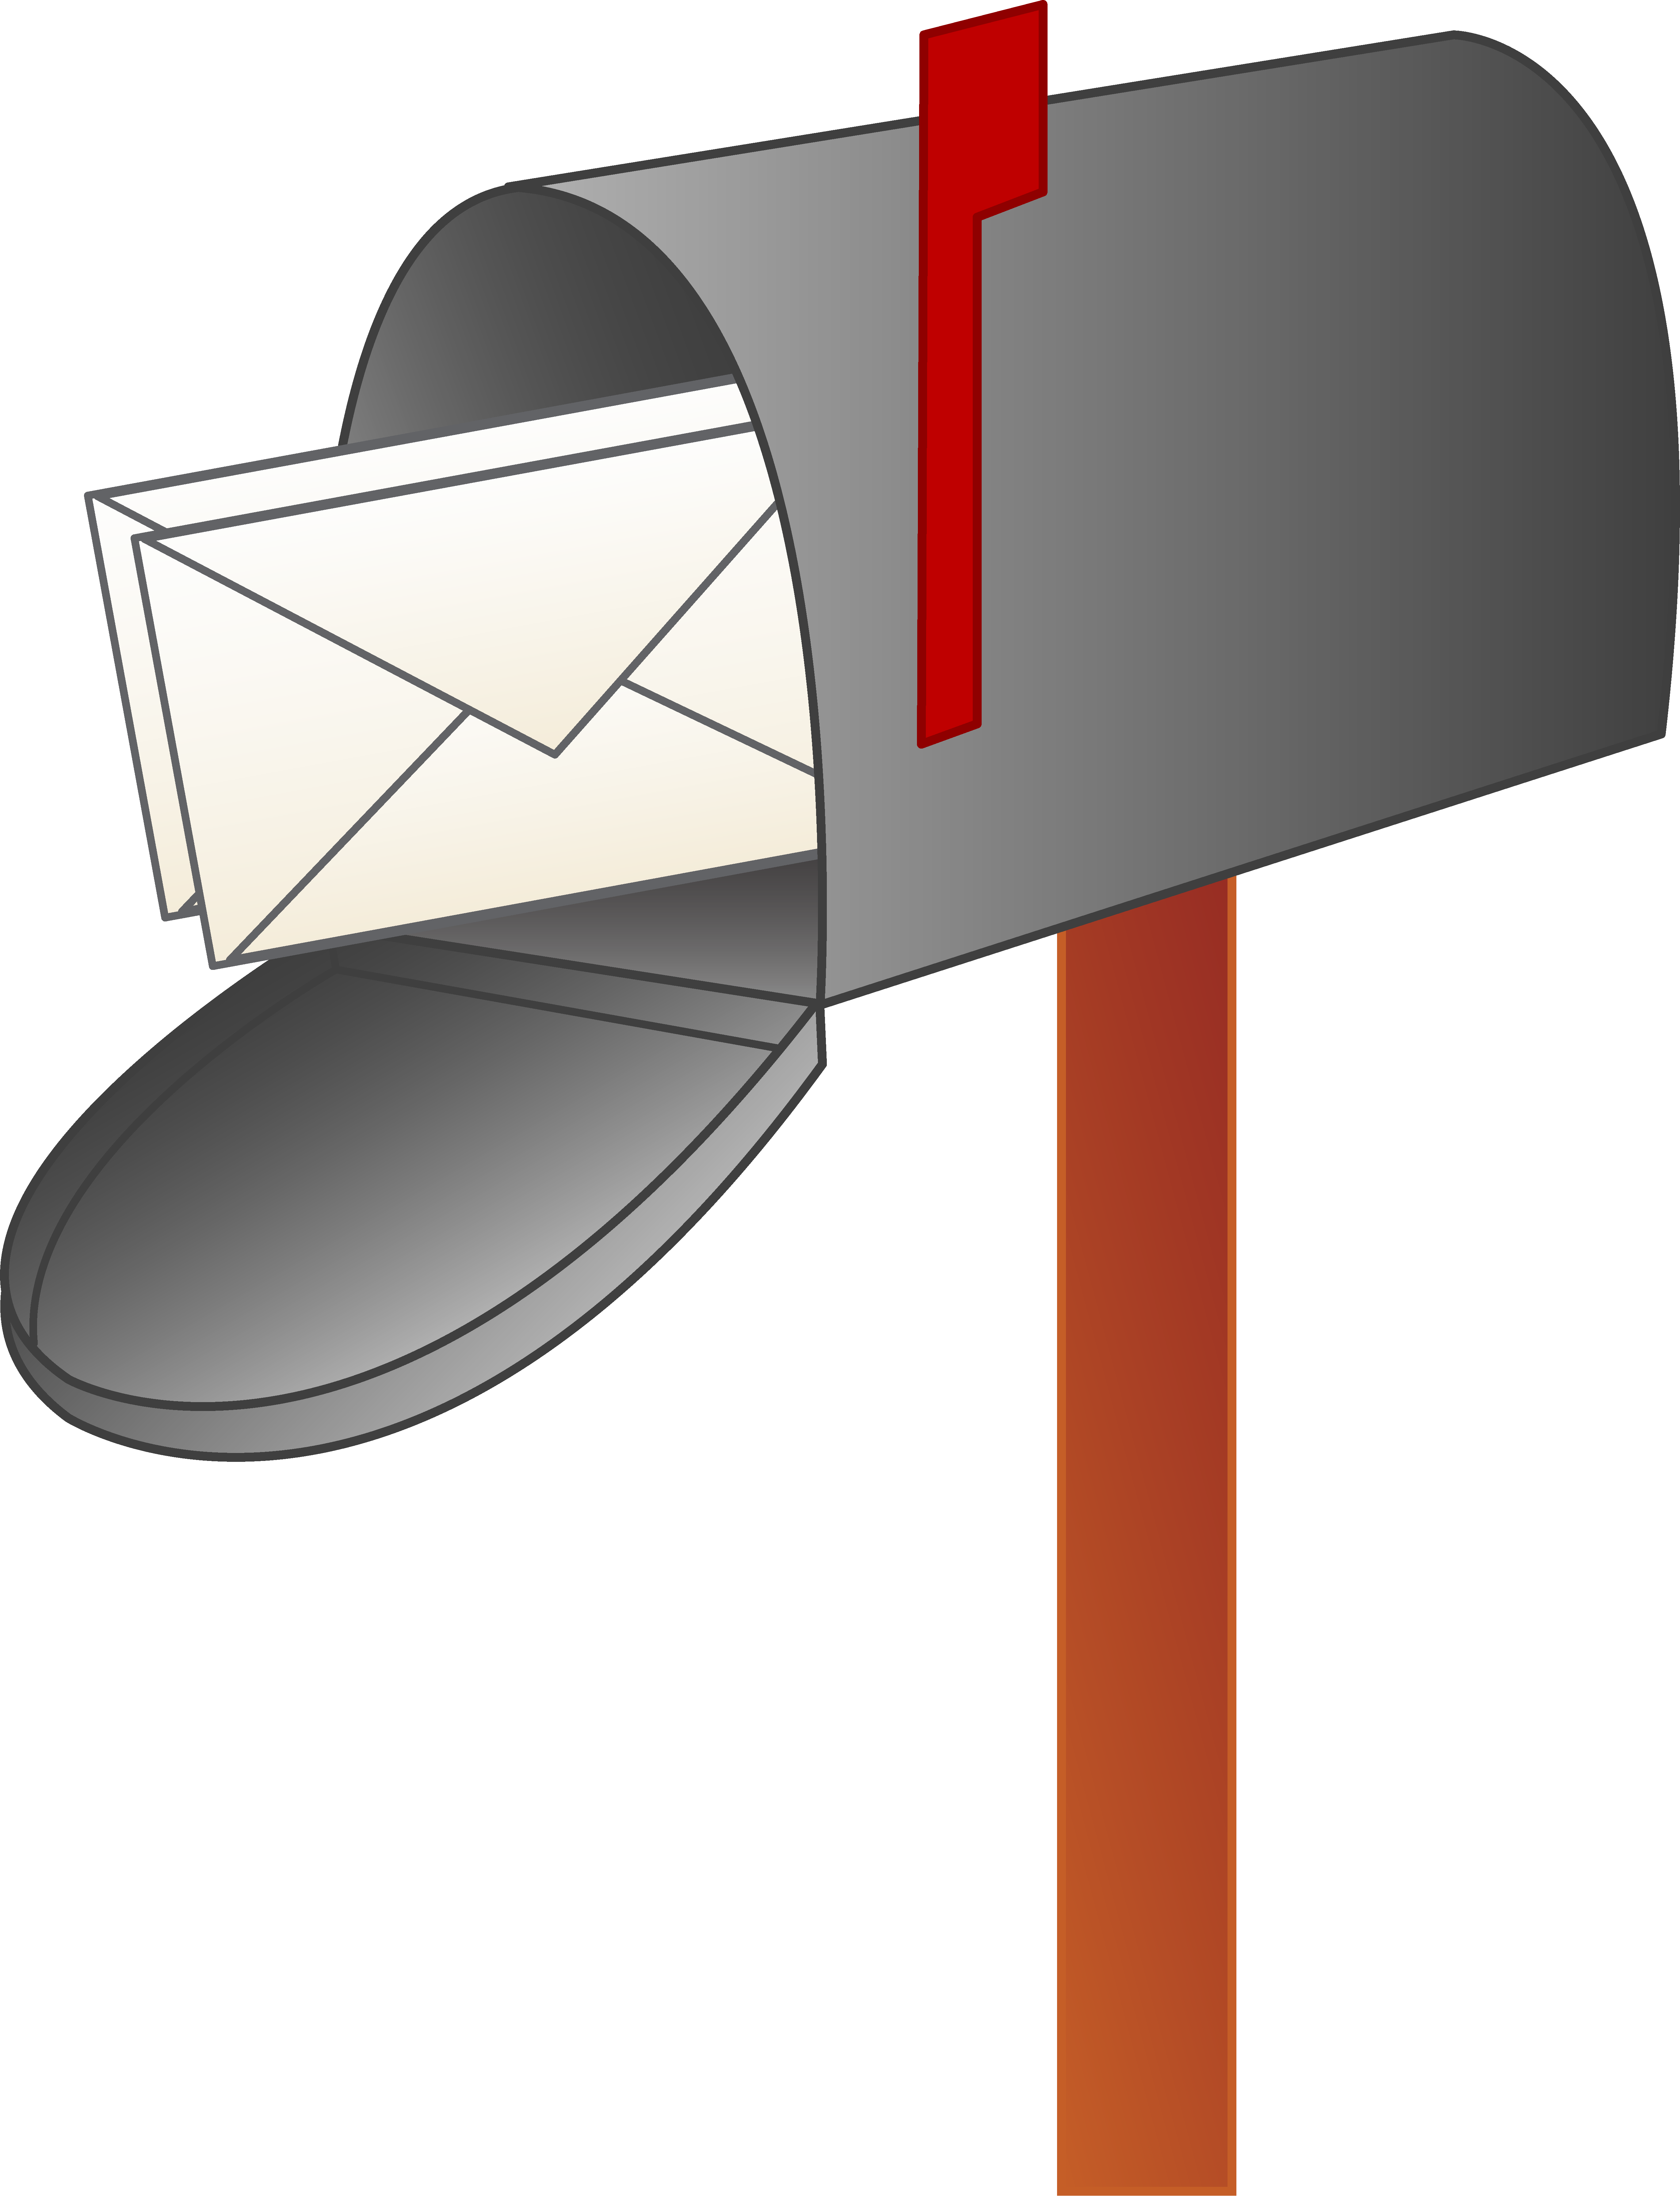 Cartoon Mailbox Clipart